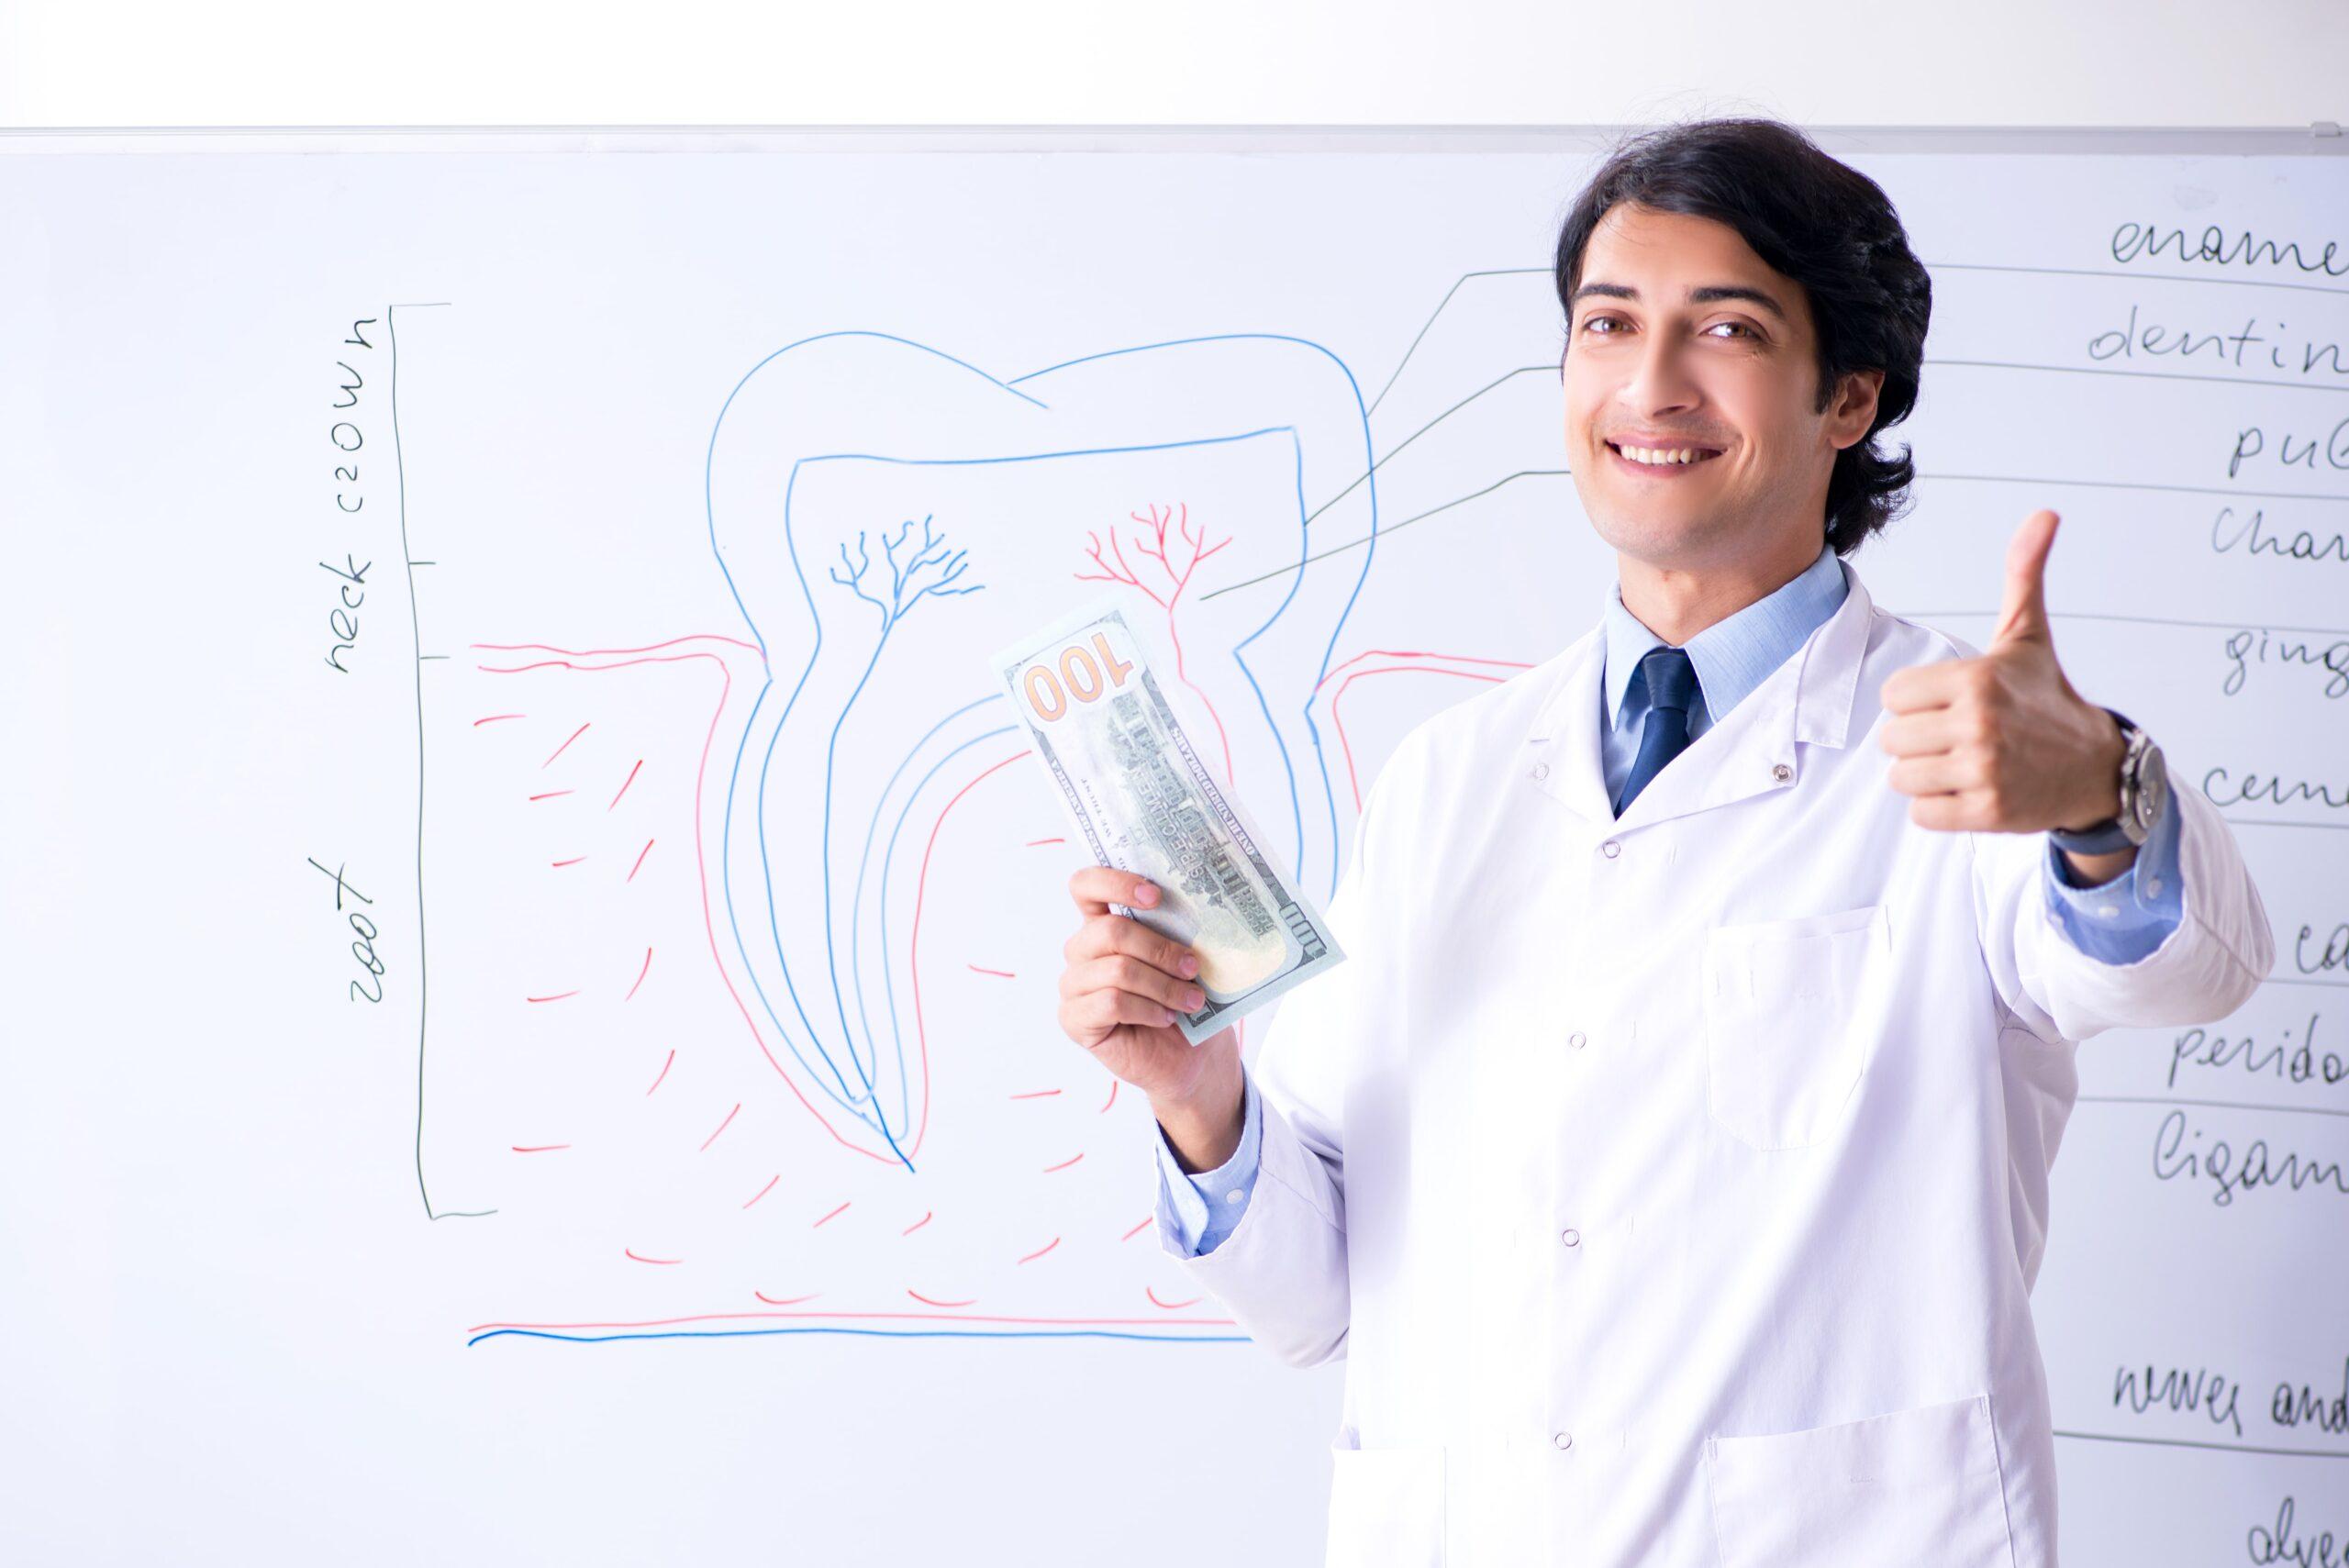 bonus dentista 1000€ enpam